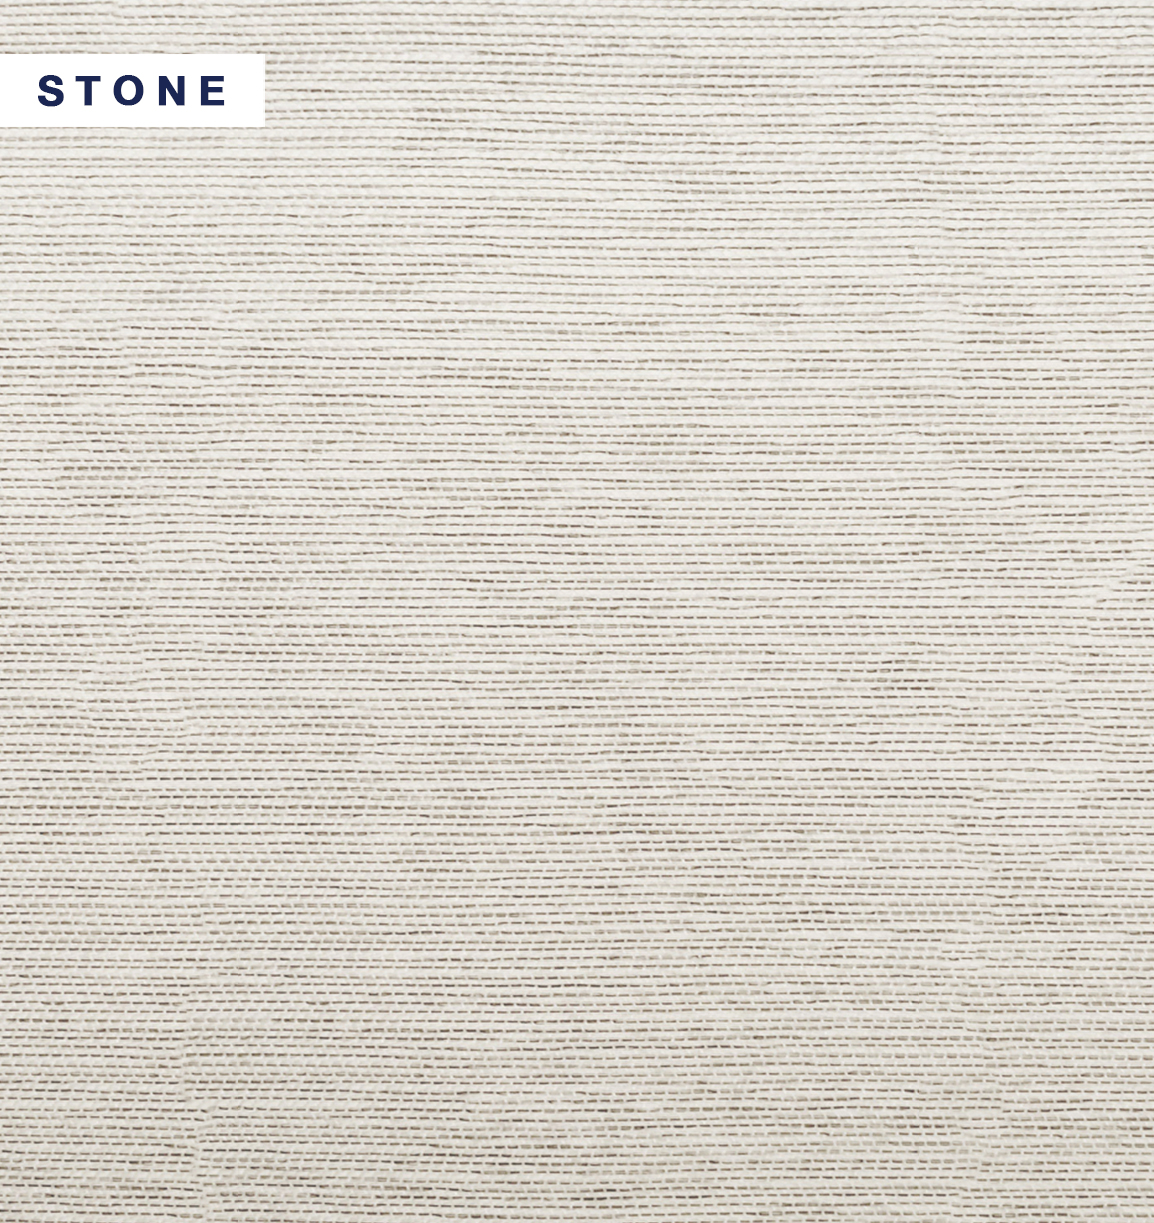 Buxton - Stone.jpg